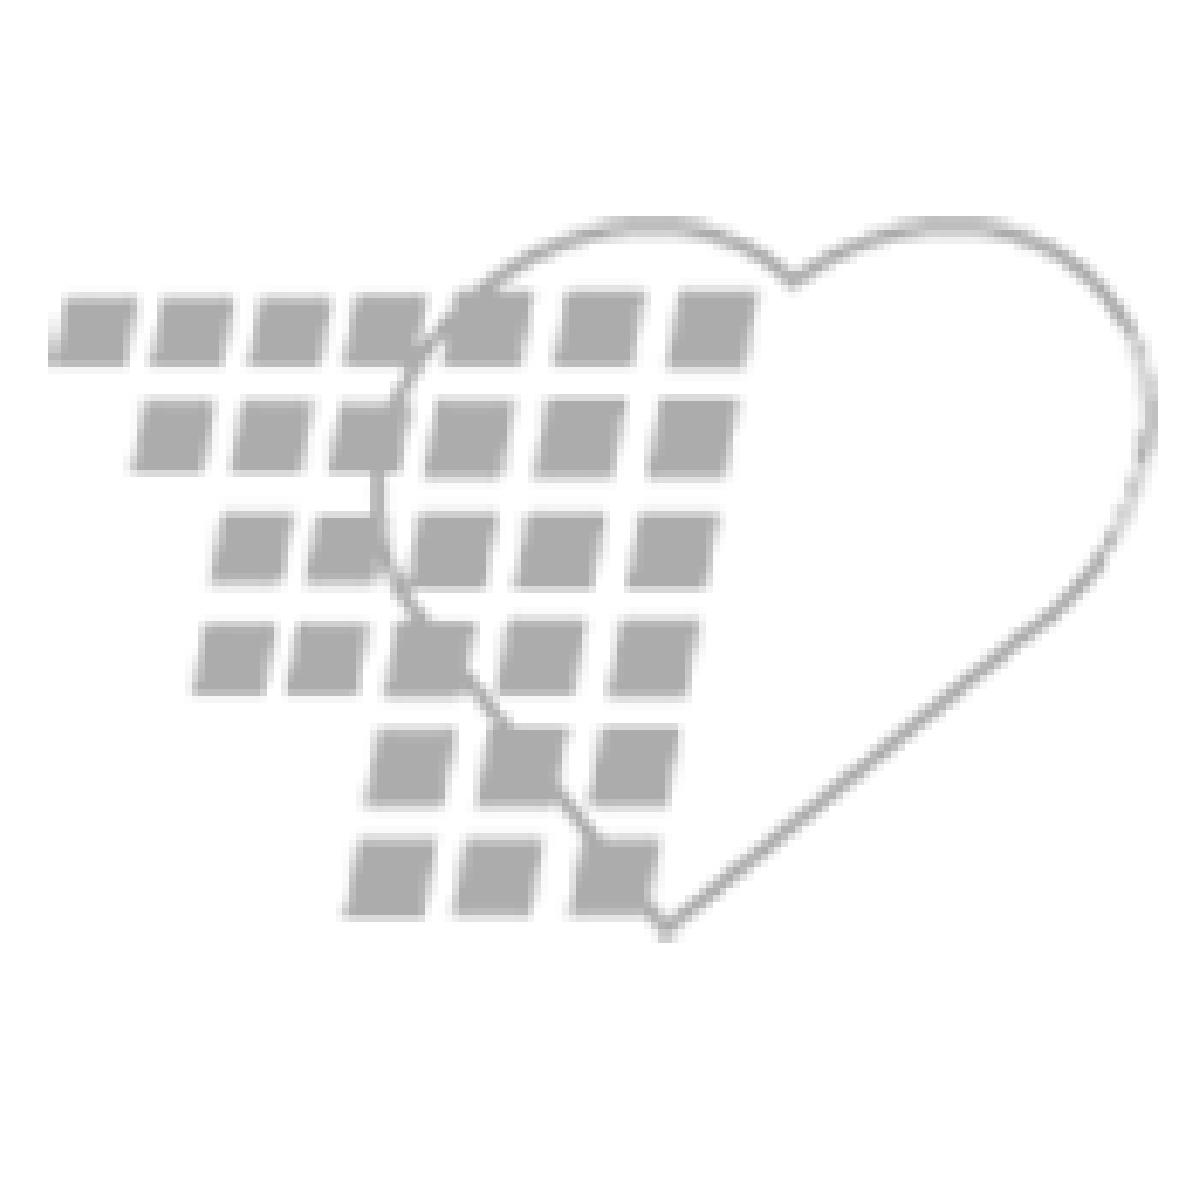 12-81-3505 Laerdal Nursing Kid (SimPad Capable)